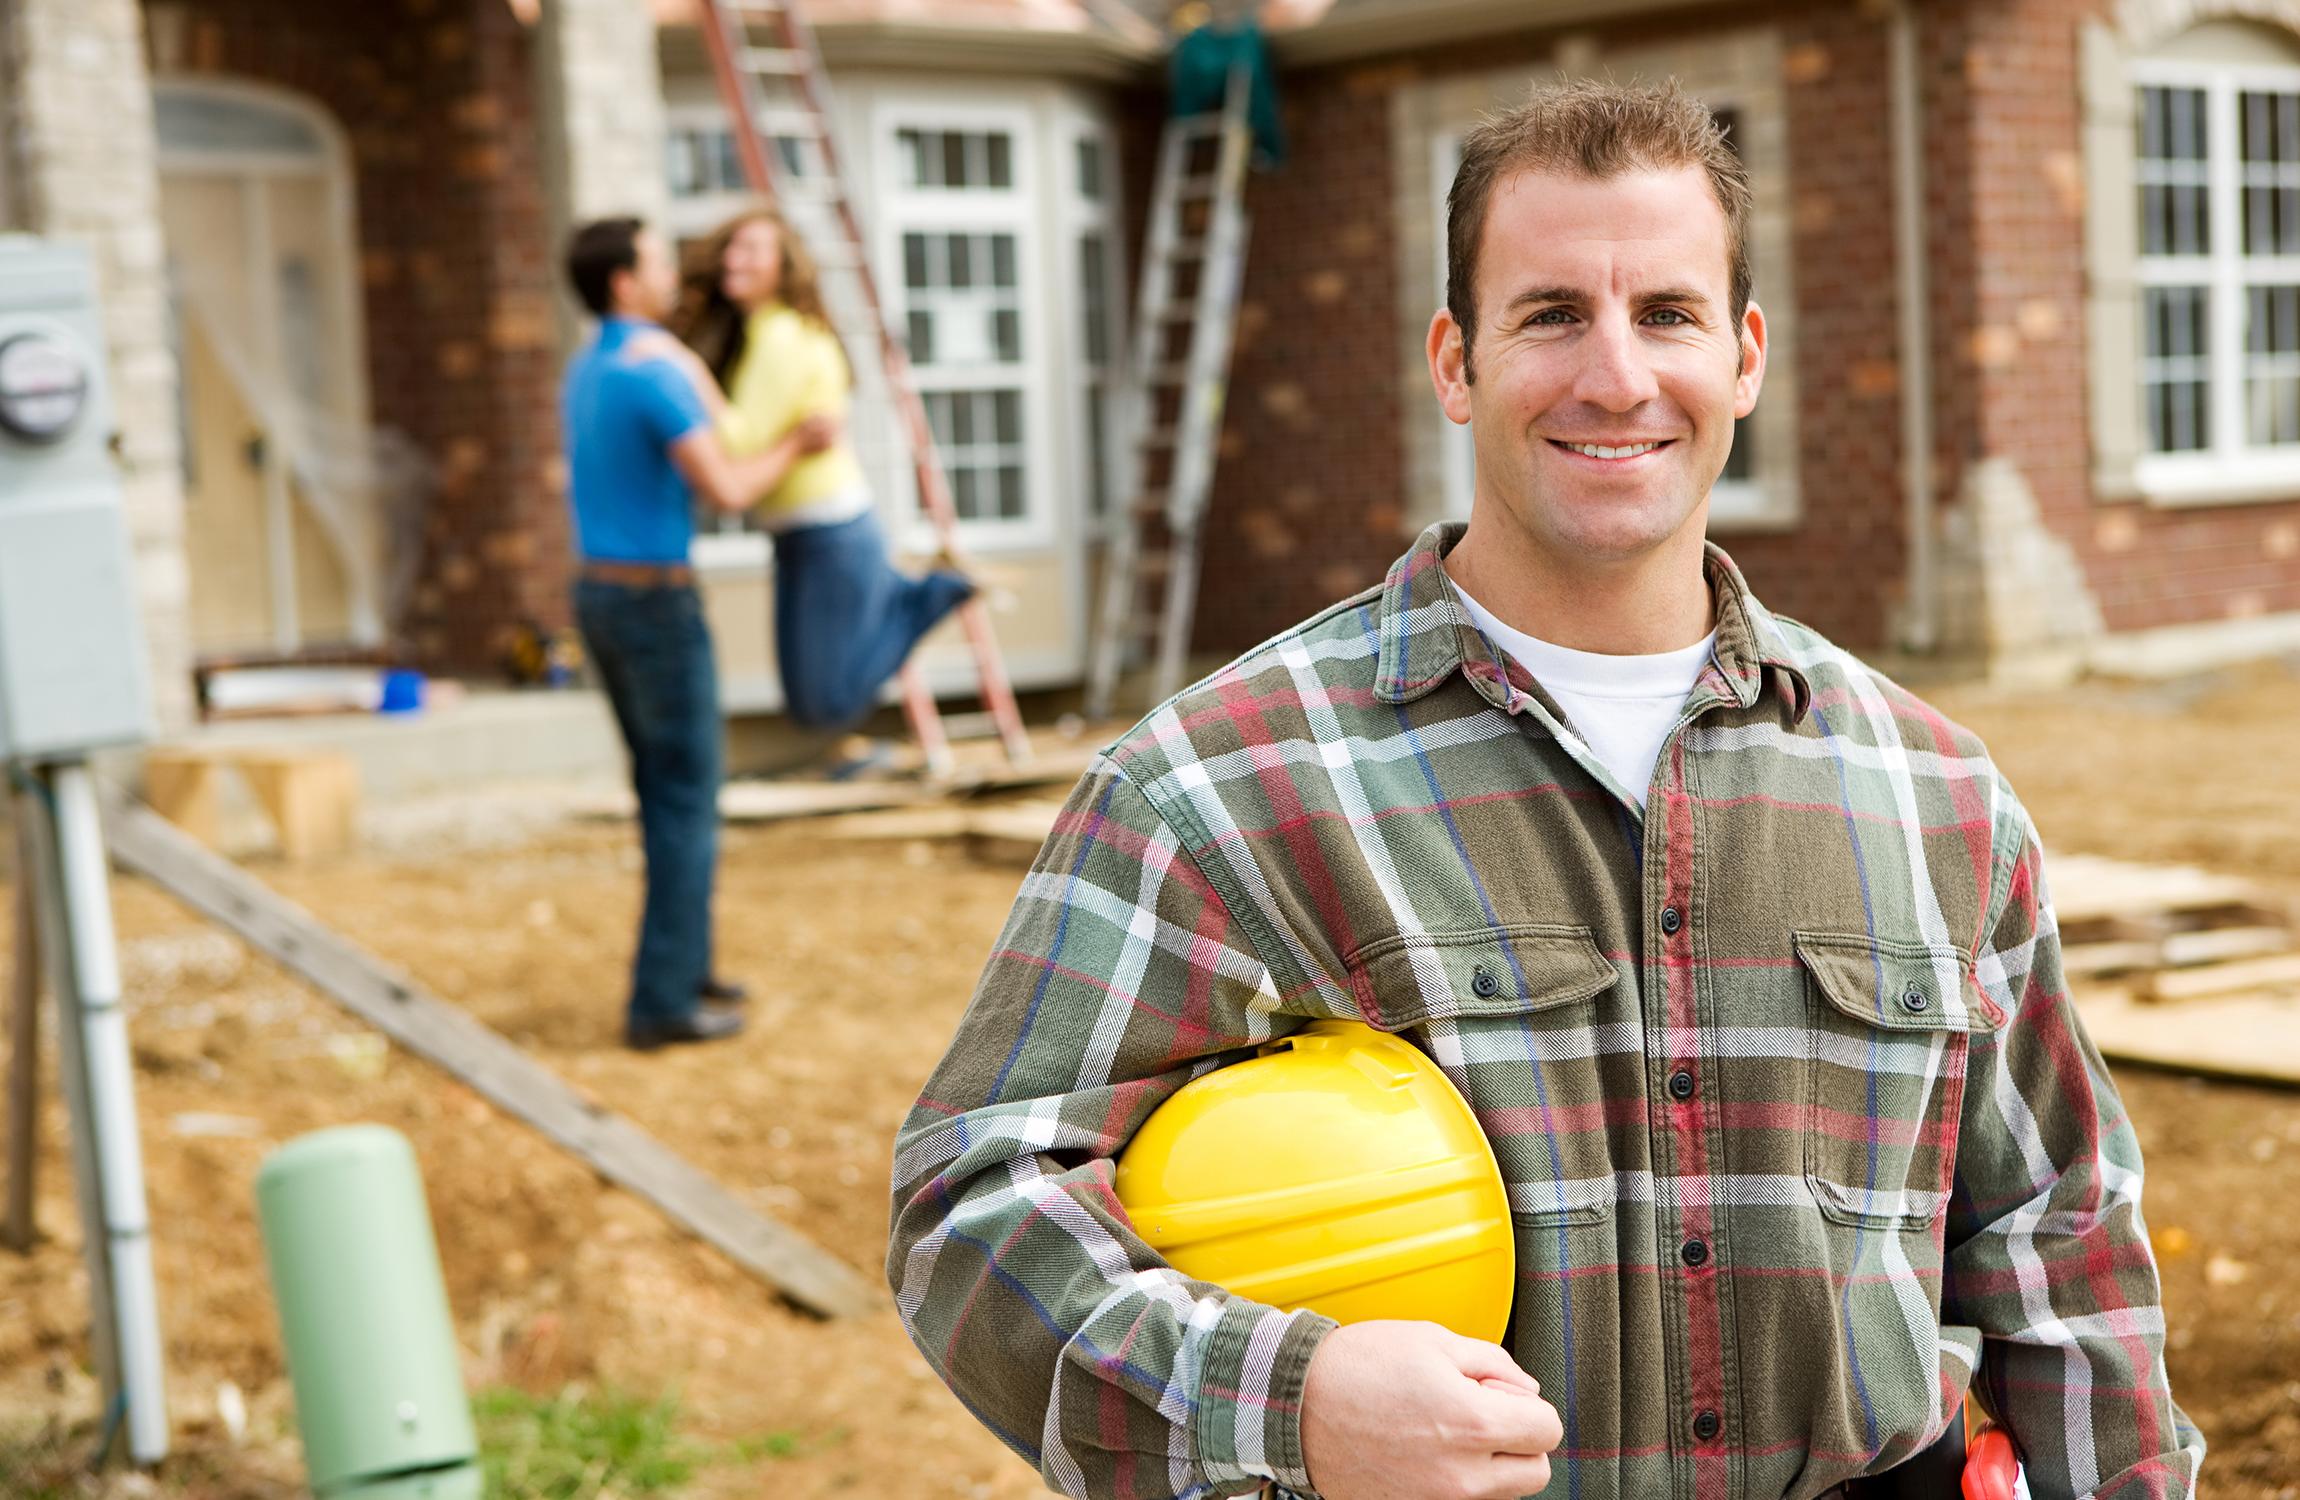 orange county business insurance, orange county auto insurance, orange county home insurance